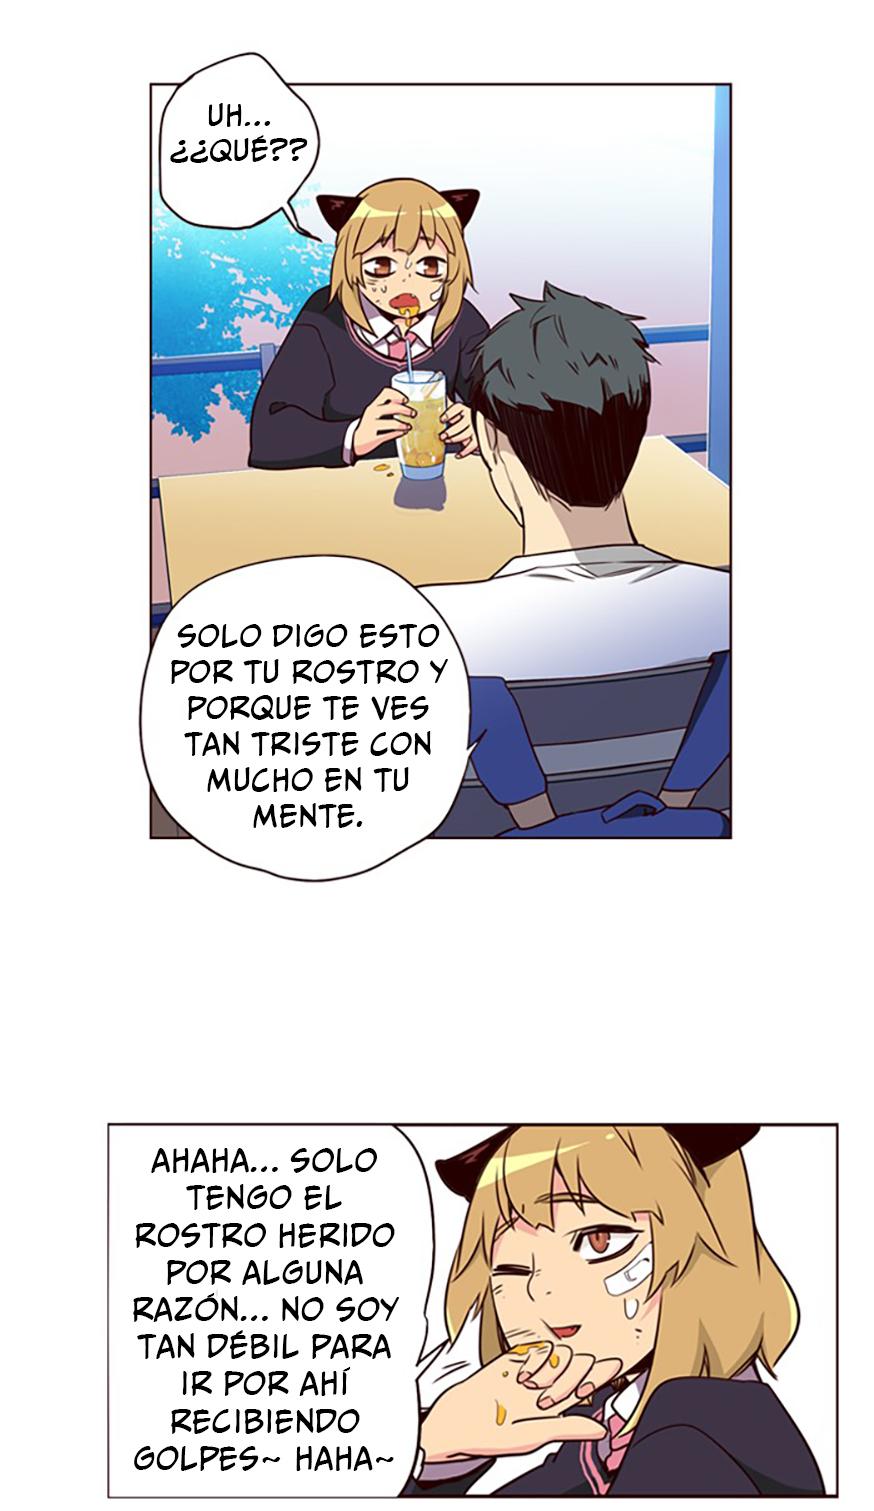 http://c5.ninemanga.com/es_manga/32/416/365988/7072a5c26d796e02dc28cb861210abba.jpg Page 19